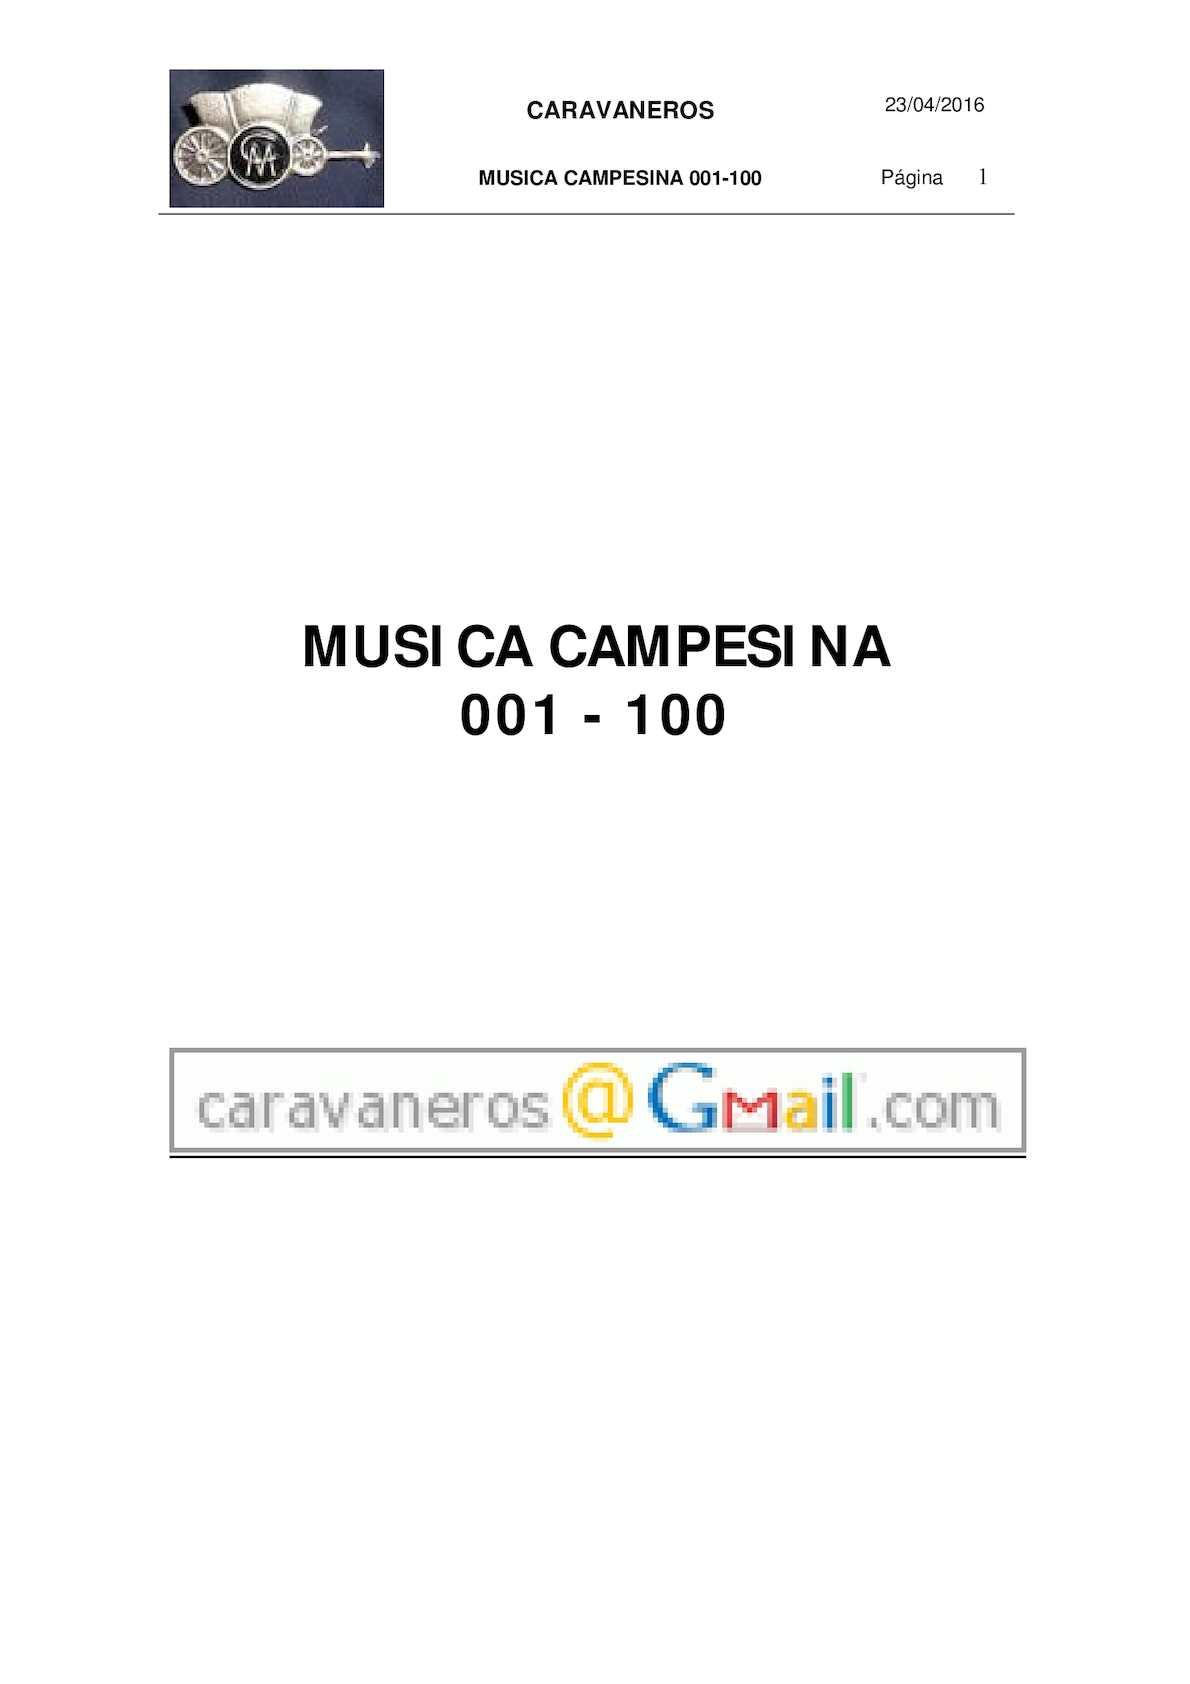 6f0c9dd92 Calaméo - Caravaneros Memoria 10 01 Música Campesina 001 100